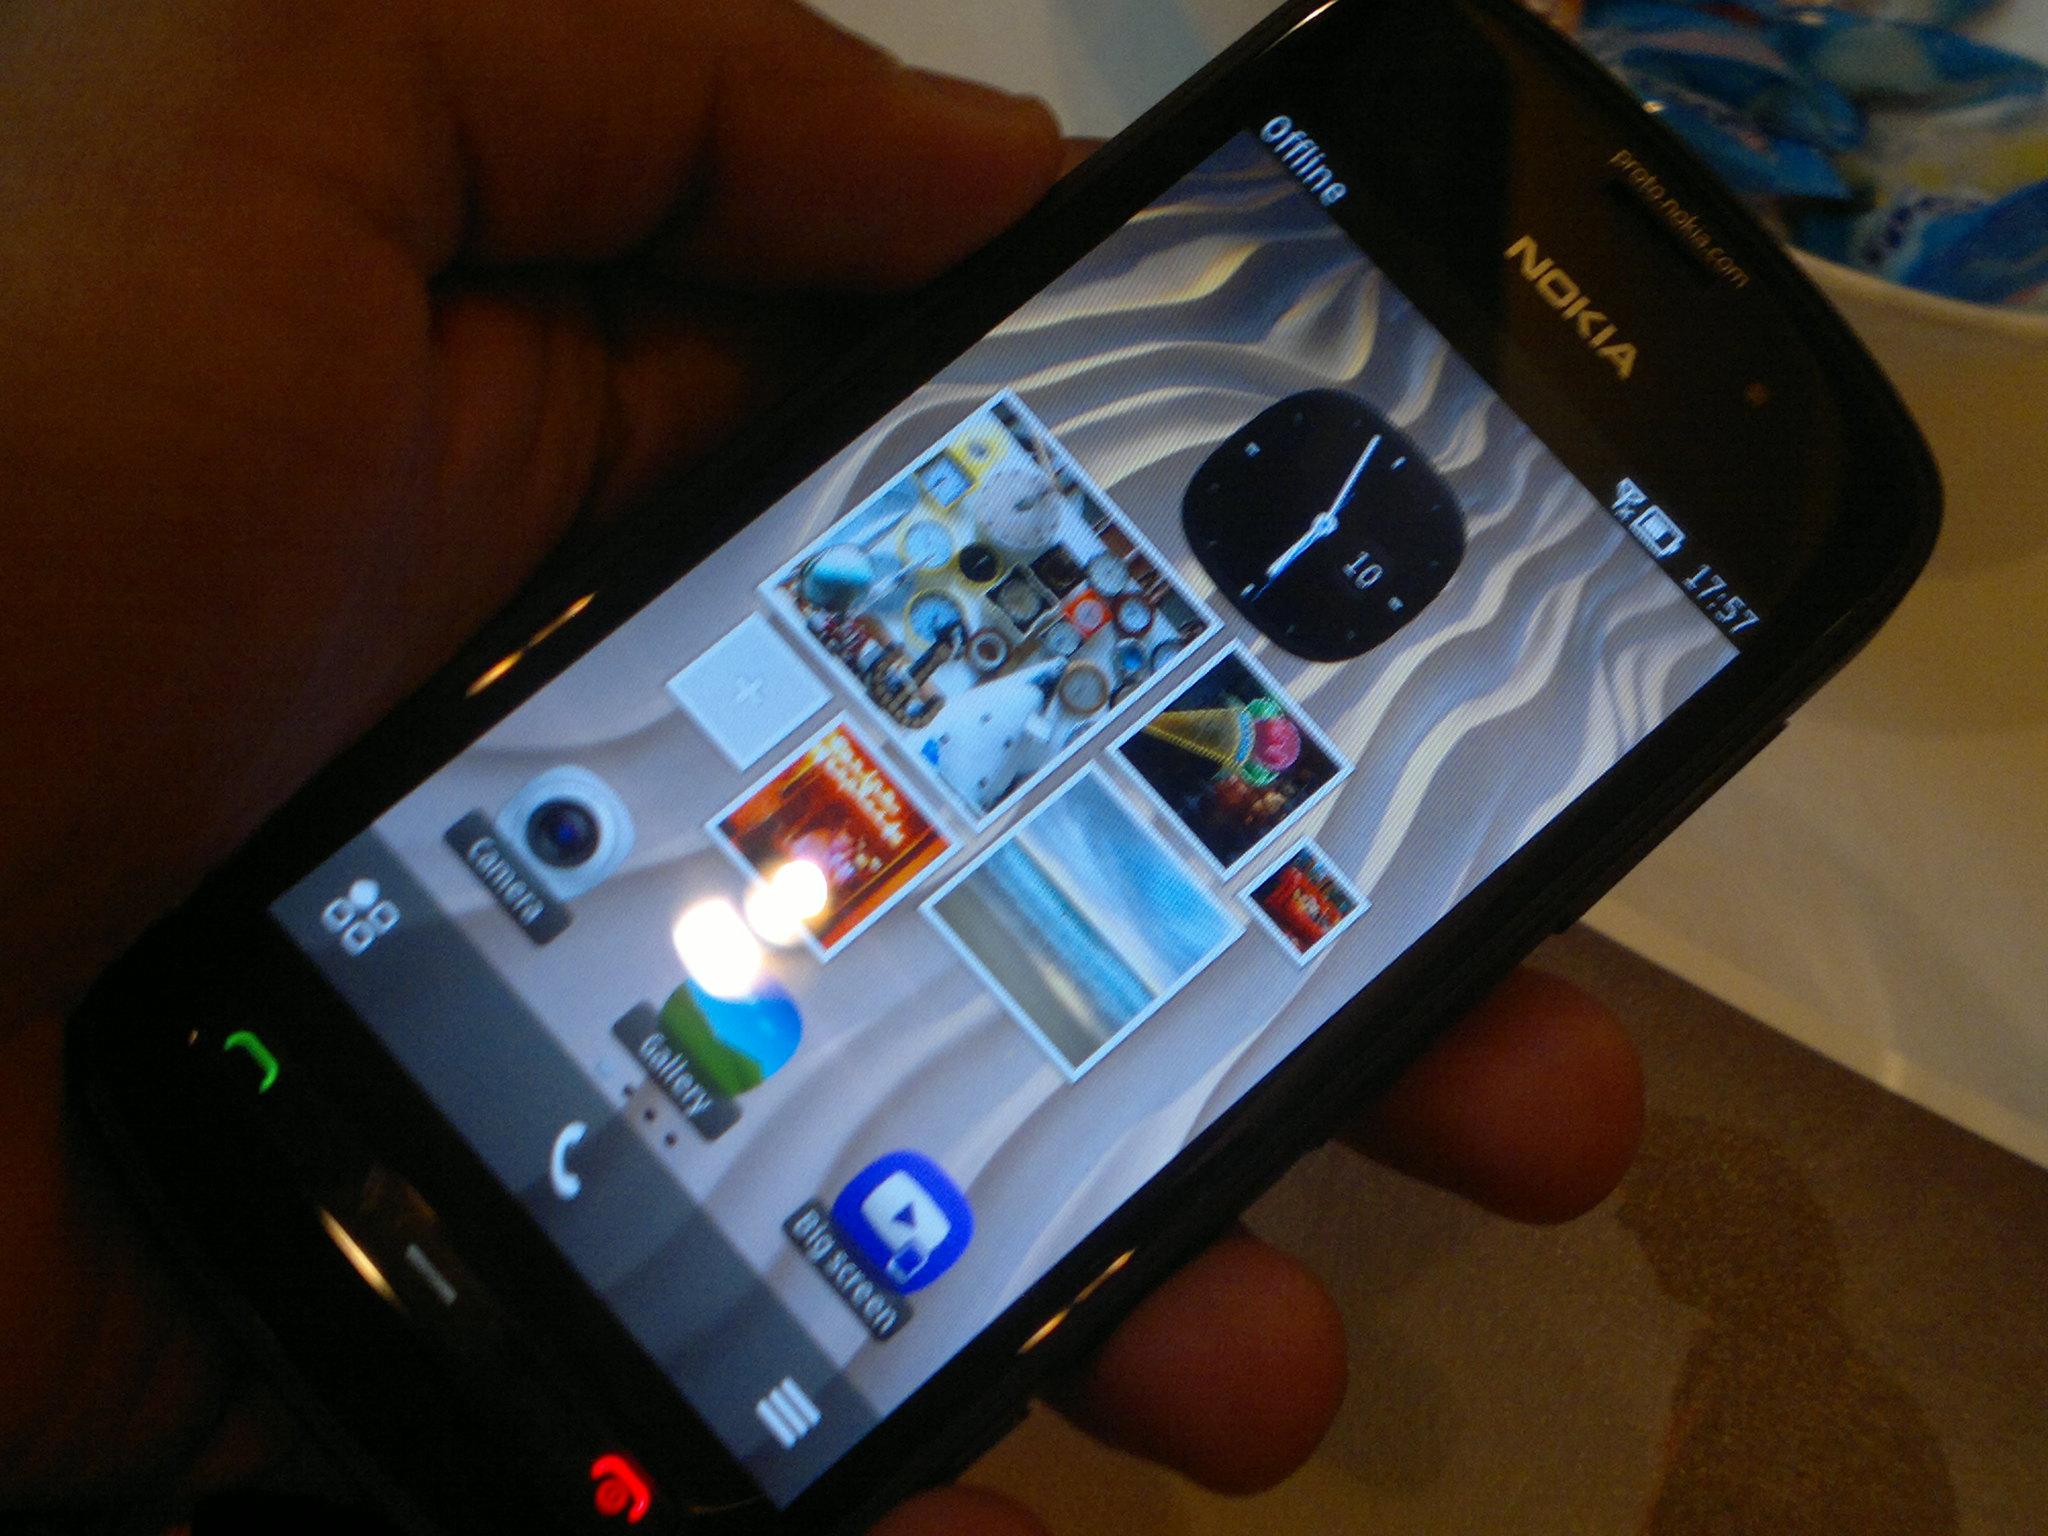 New Homescreen Widgets